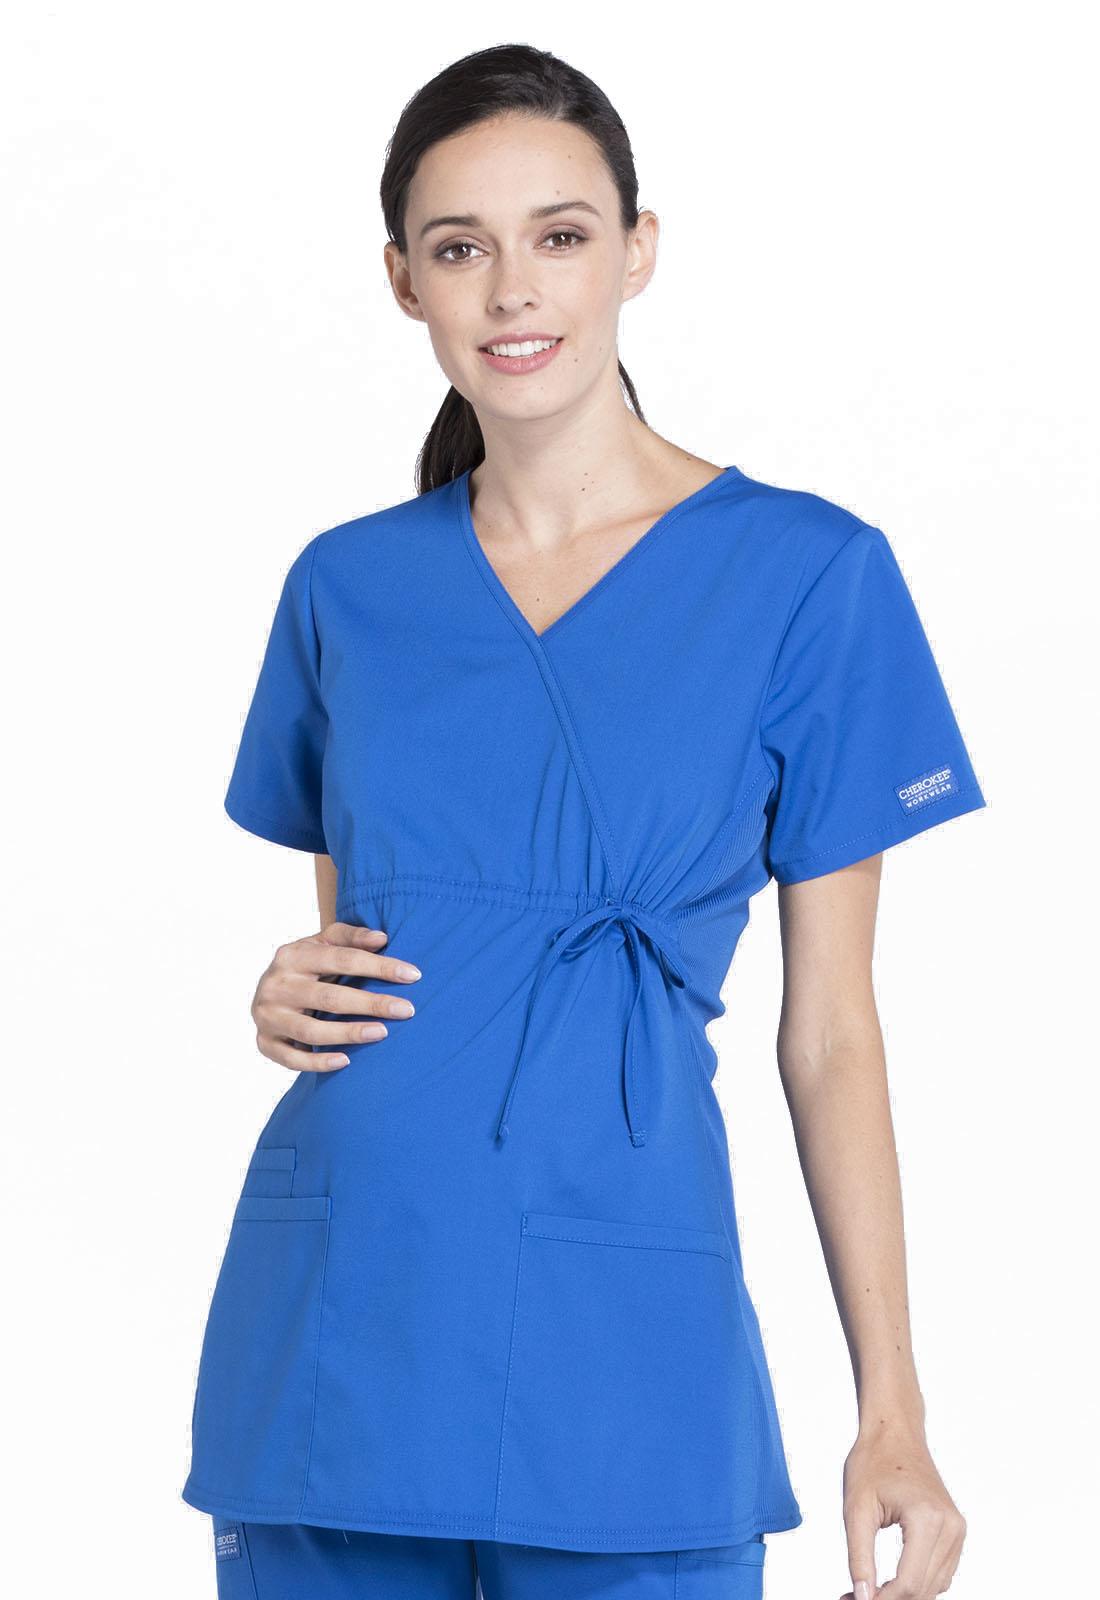 fc507fa4061 WW Professionals Maternity Mock Wrap Top WW685-ROY from JMJ Medical ...